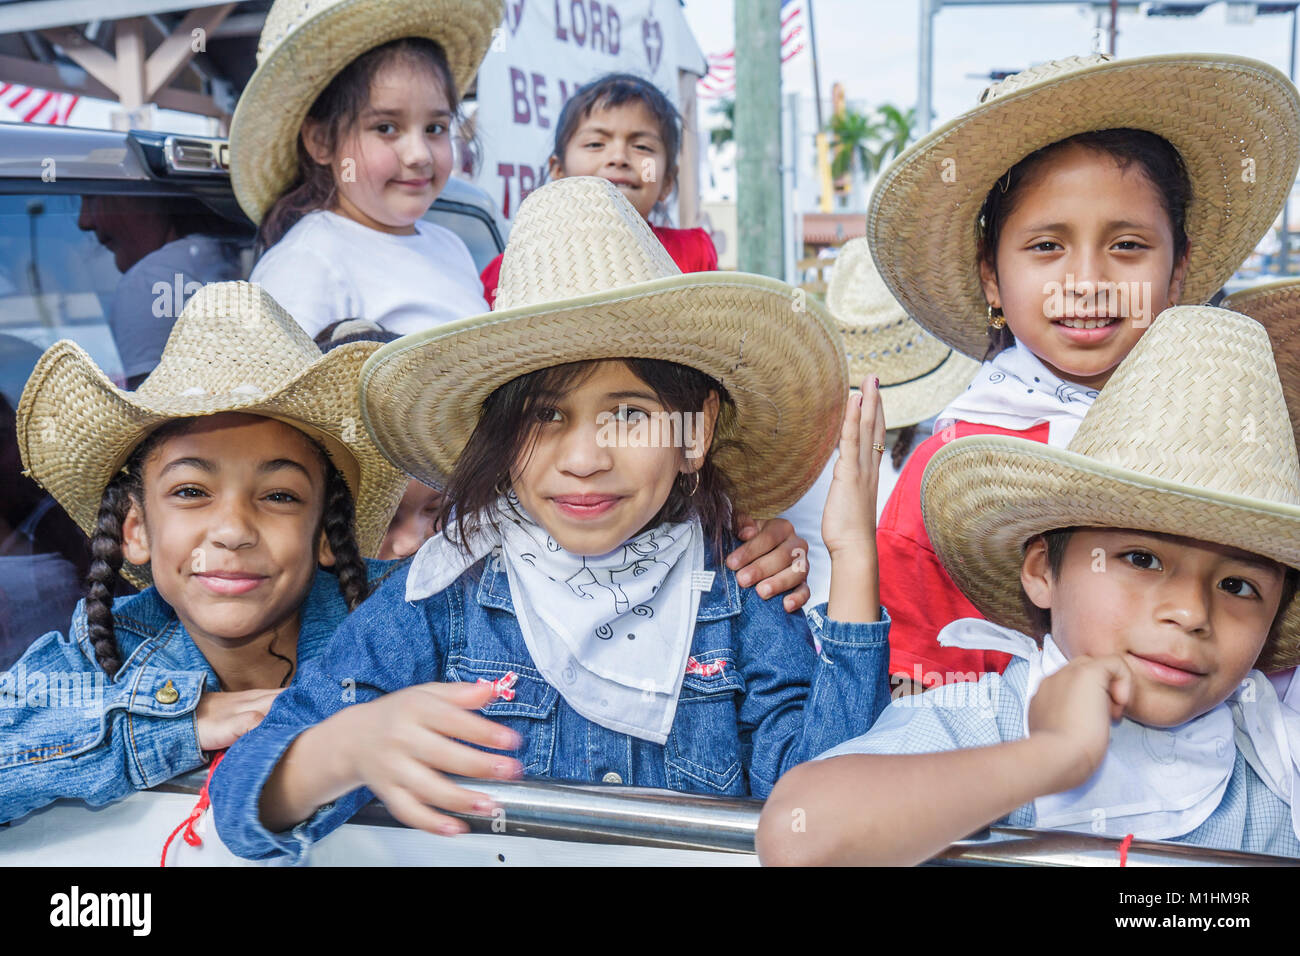 tradition Hispanic girls boy children Mexican hats bandanas Western attire outfit - Stock Image